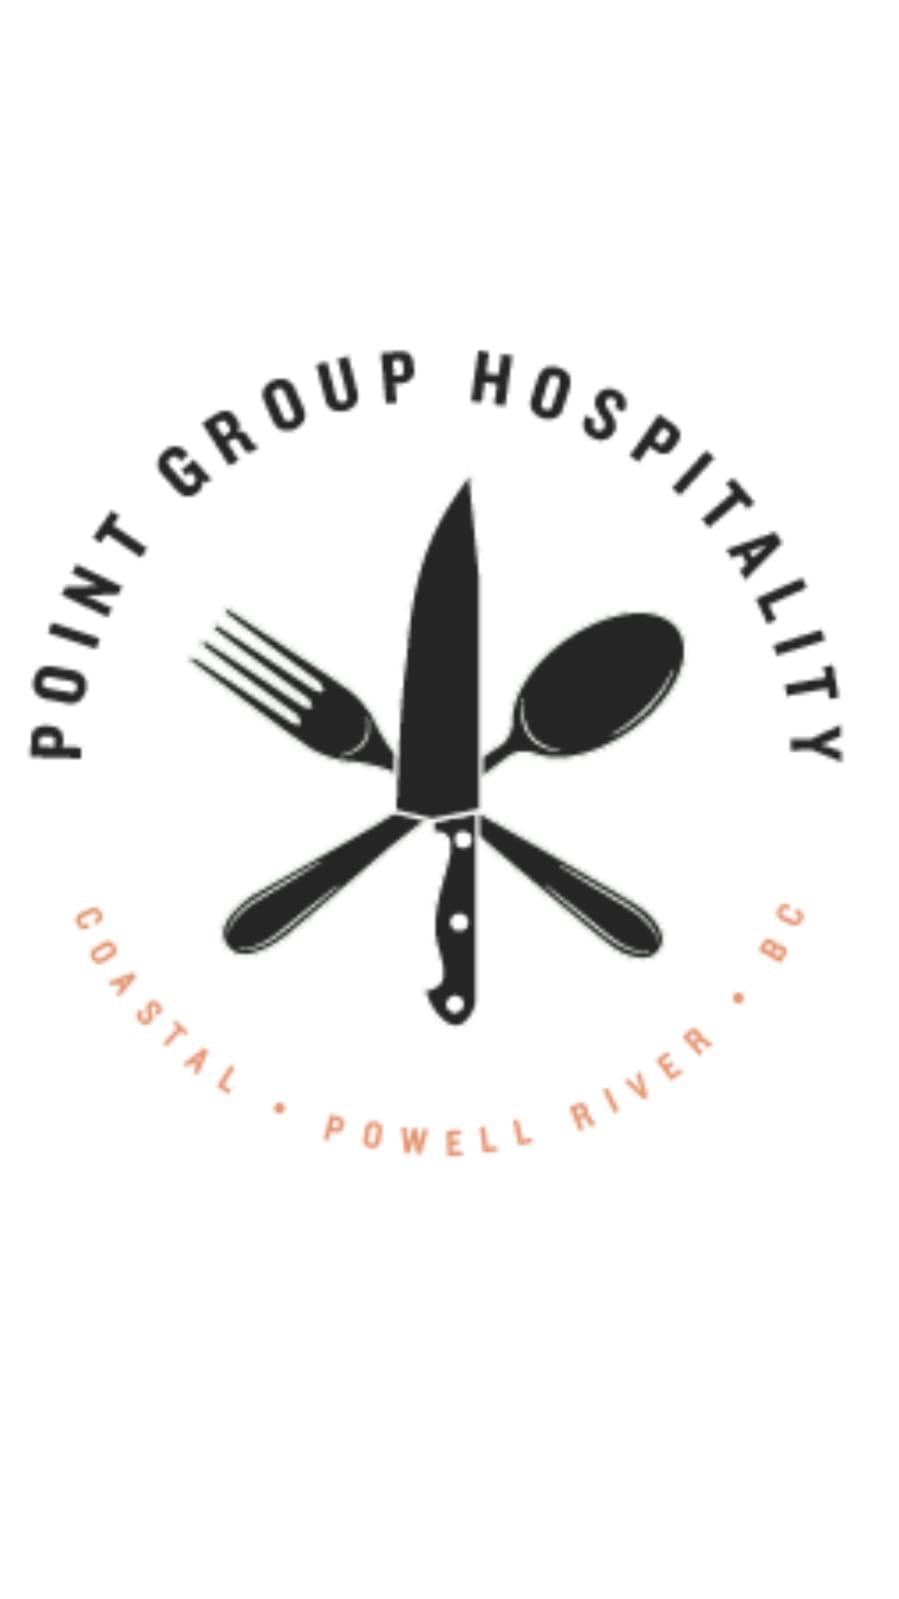 point group hospitality